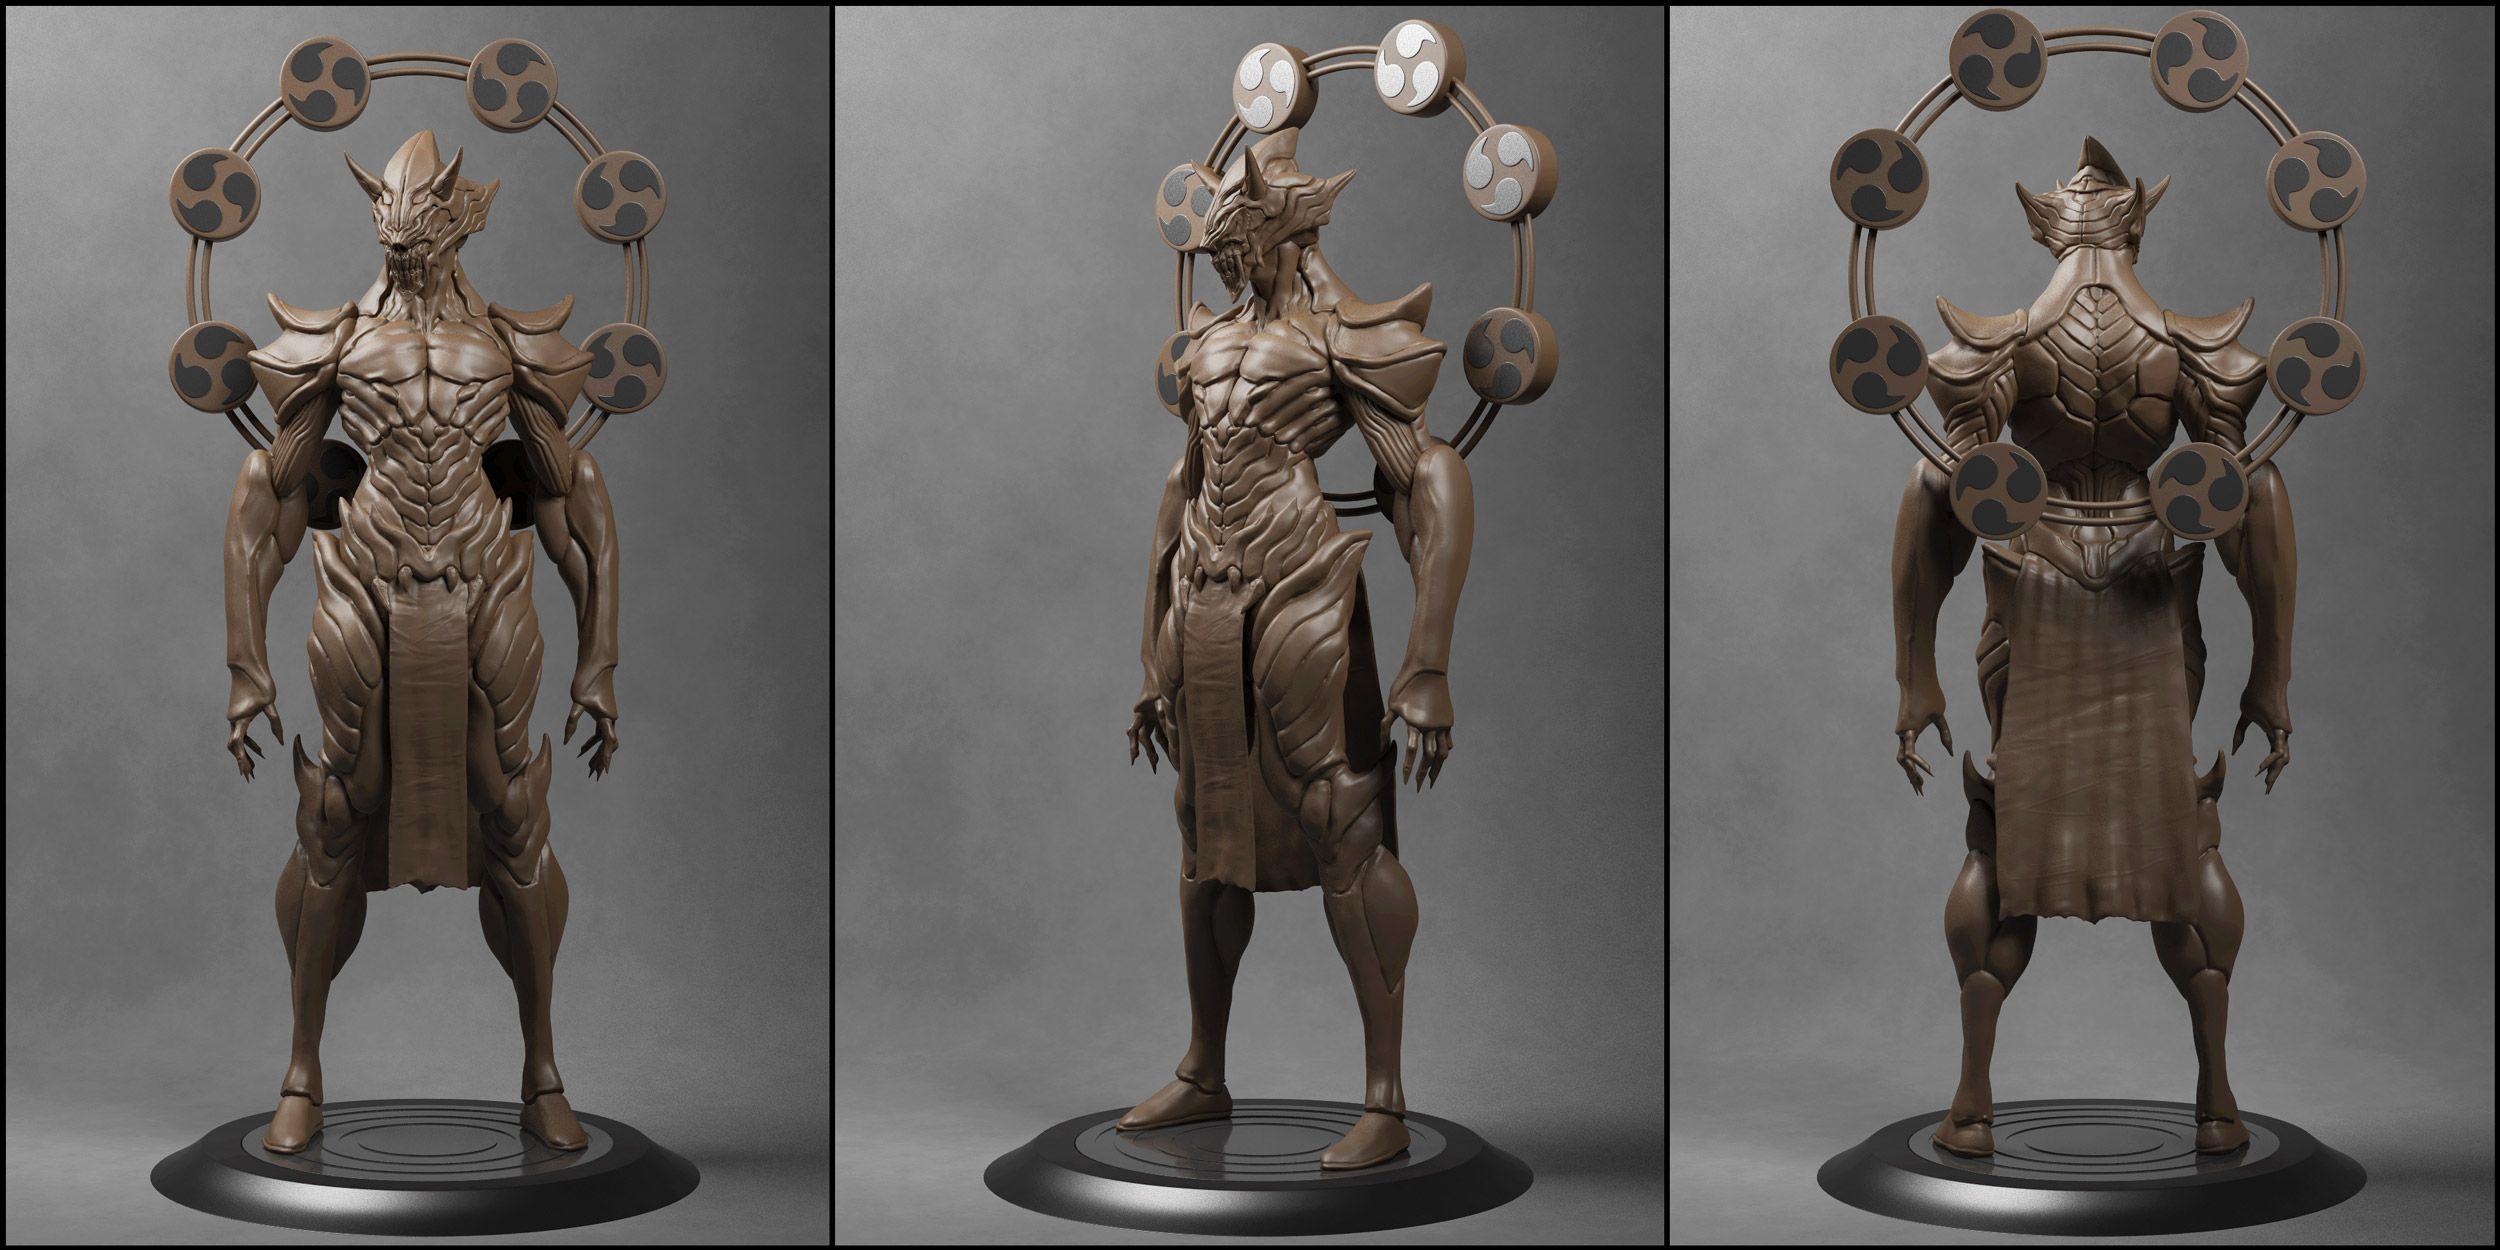 Oni-Raijin [Clay Render] by Khempavee on deviantART